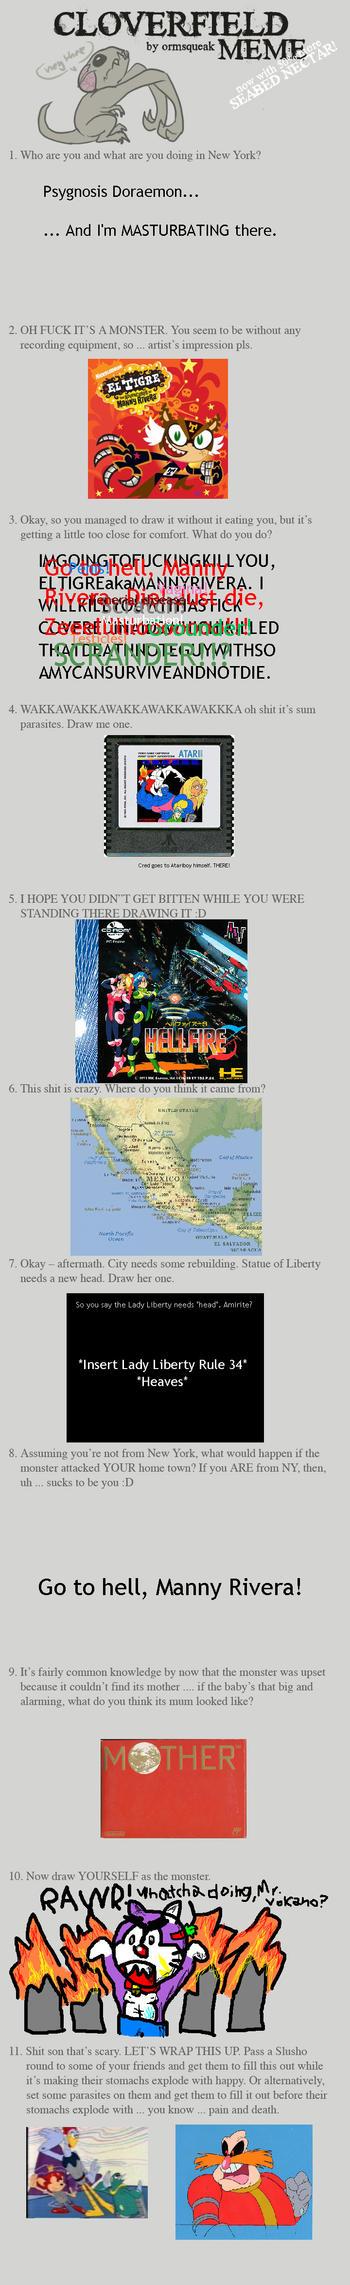 Cloverfield Memes, on my dA? by MrSmiley-992